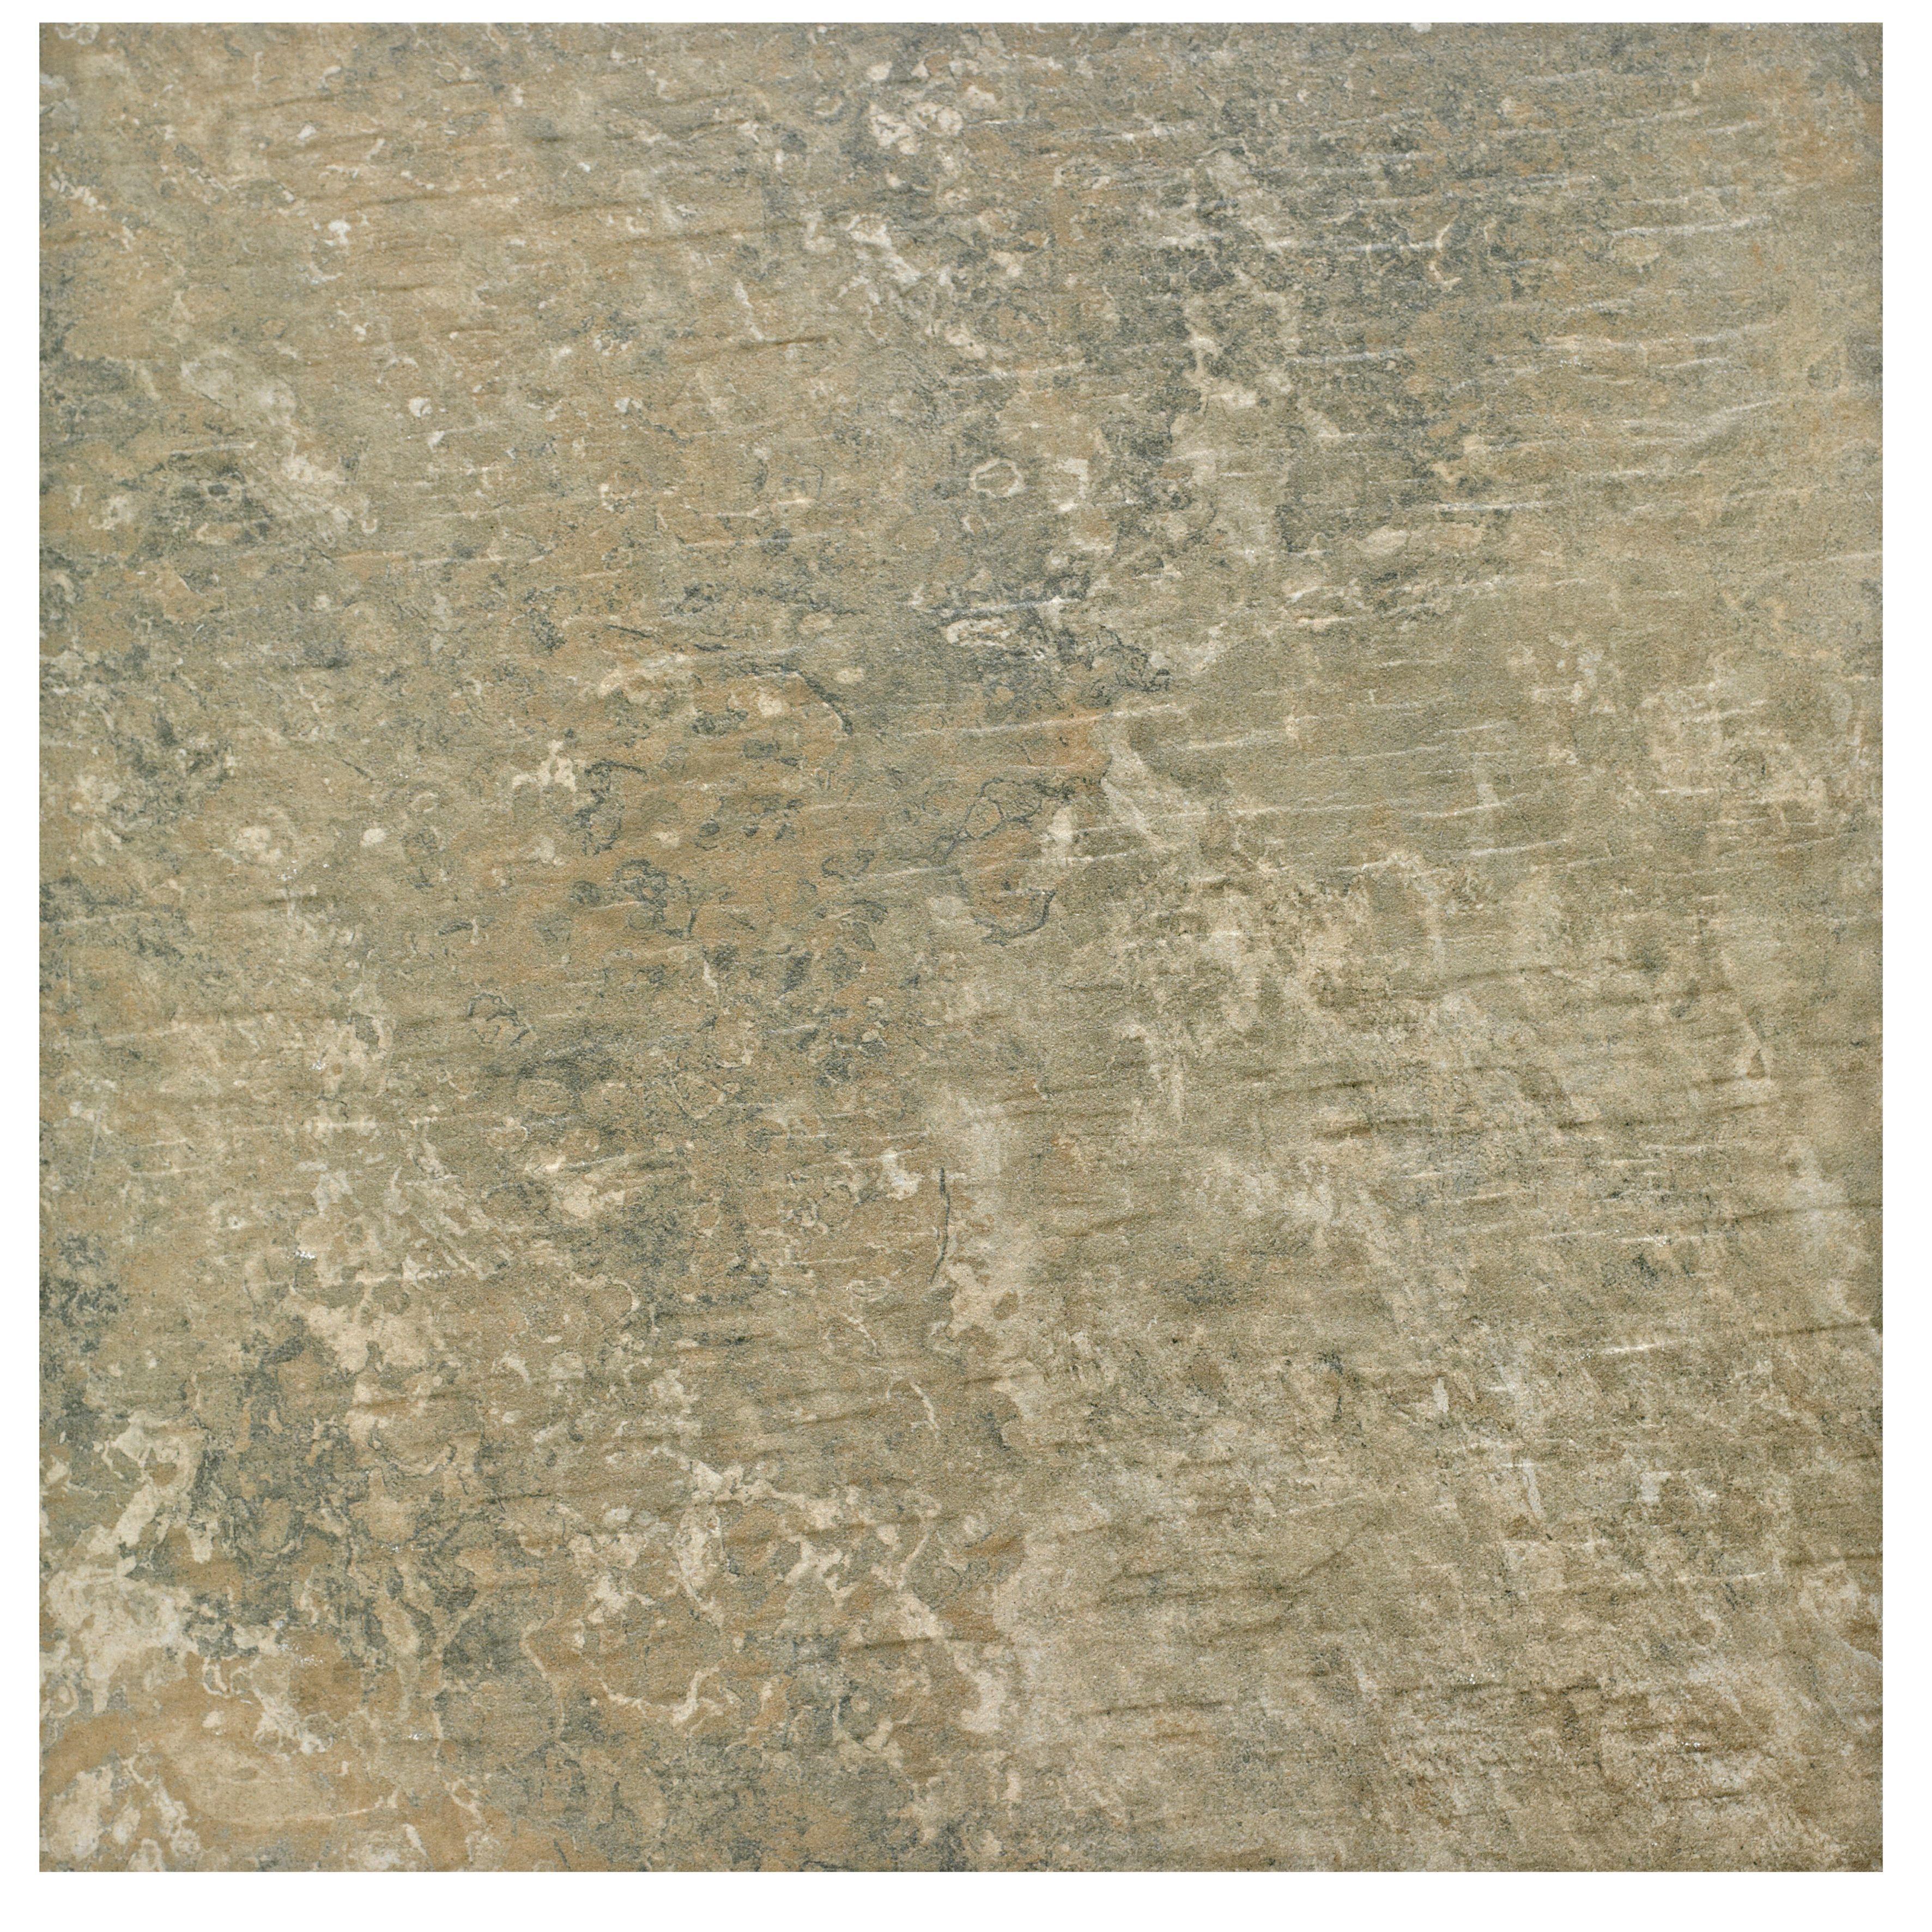 Brook Natural Stone Effect Porcelain Wall & Floor Tile, Pack Of 5, (l)450mm (w)450mm